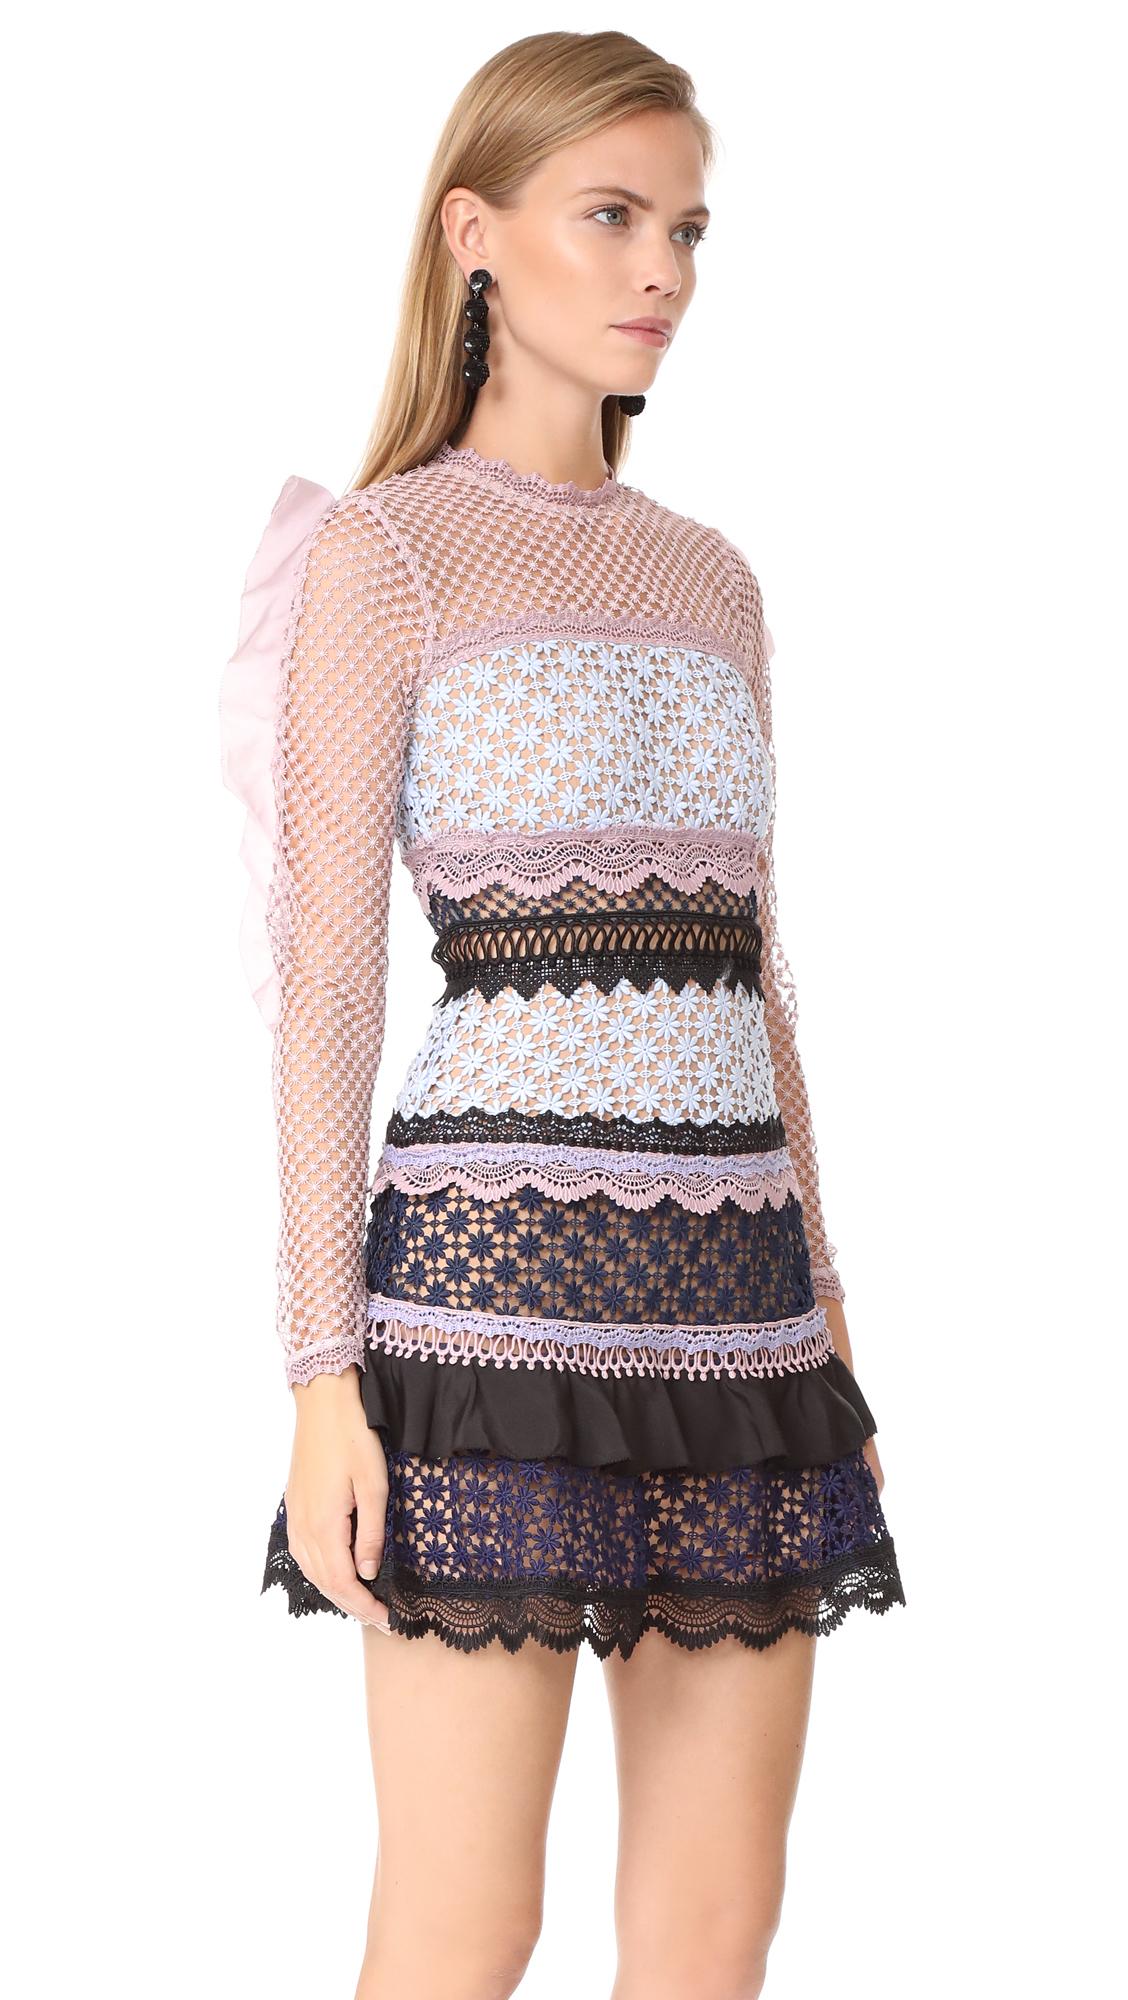 b244c1688768 Self Portrait Bellis Lace Trim Dress with Frilled Sleeves | SHOPBOP